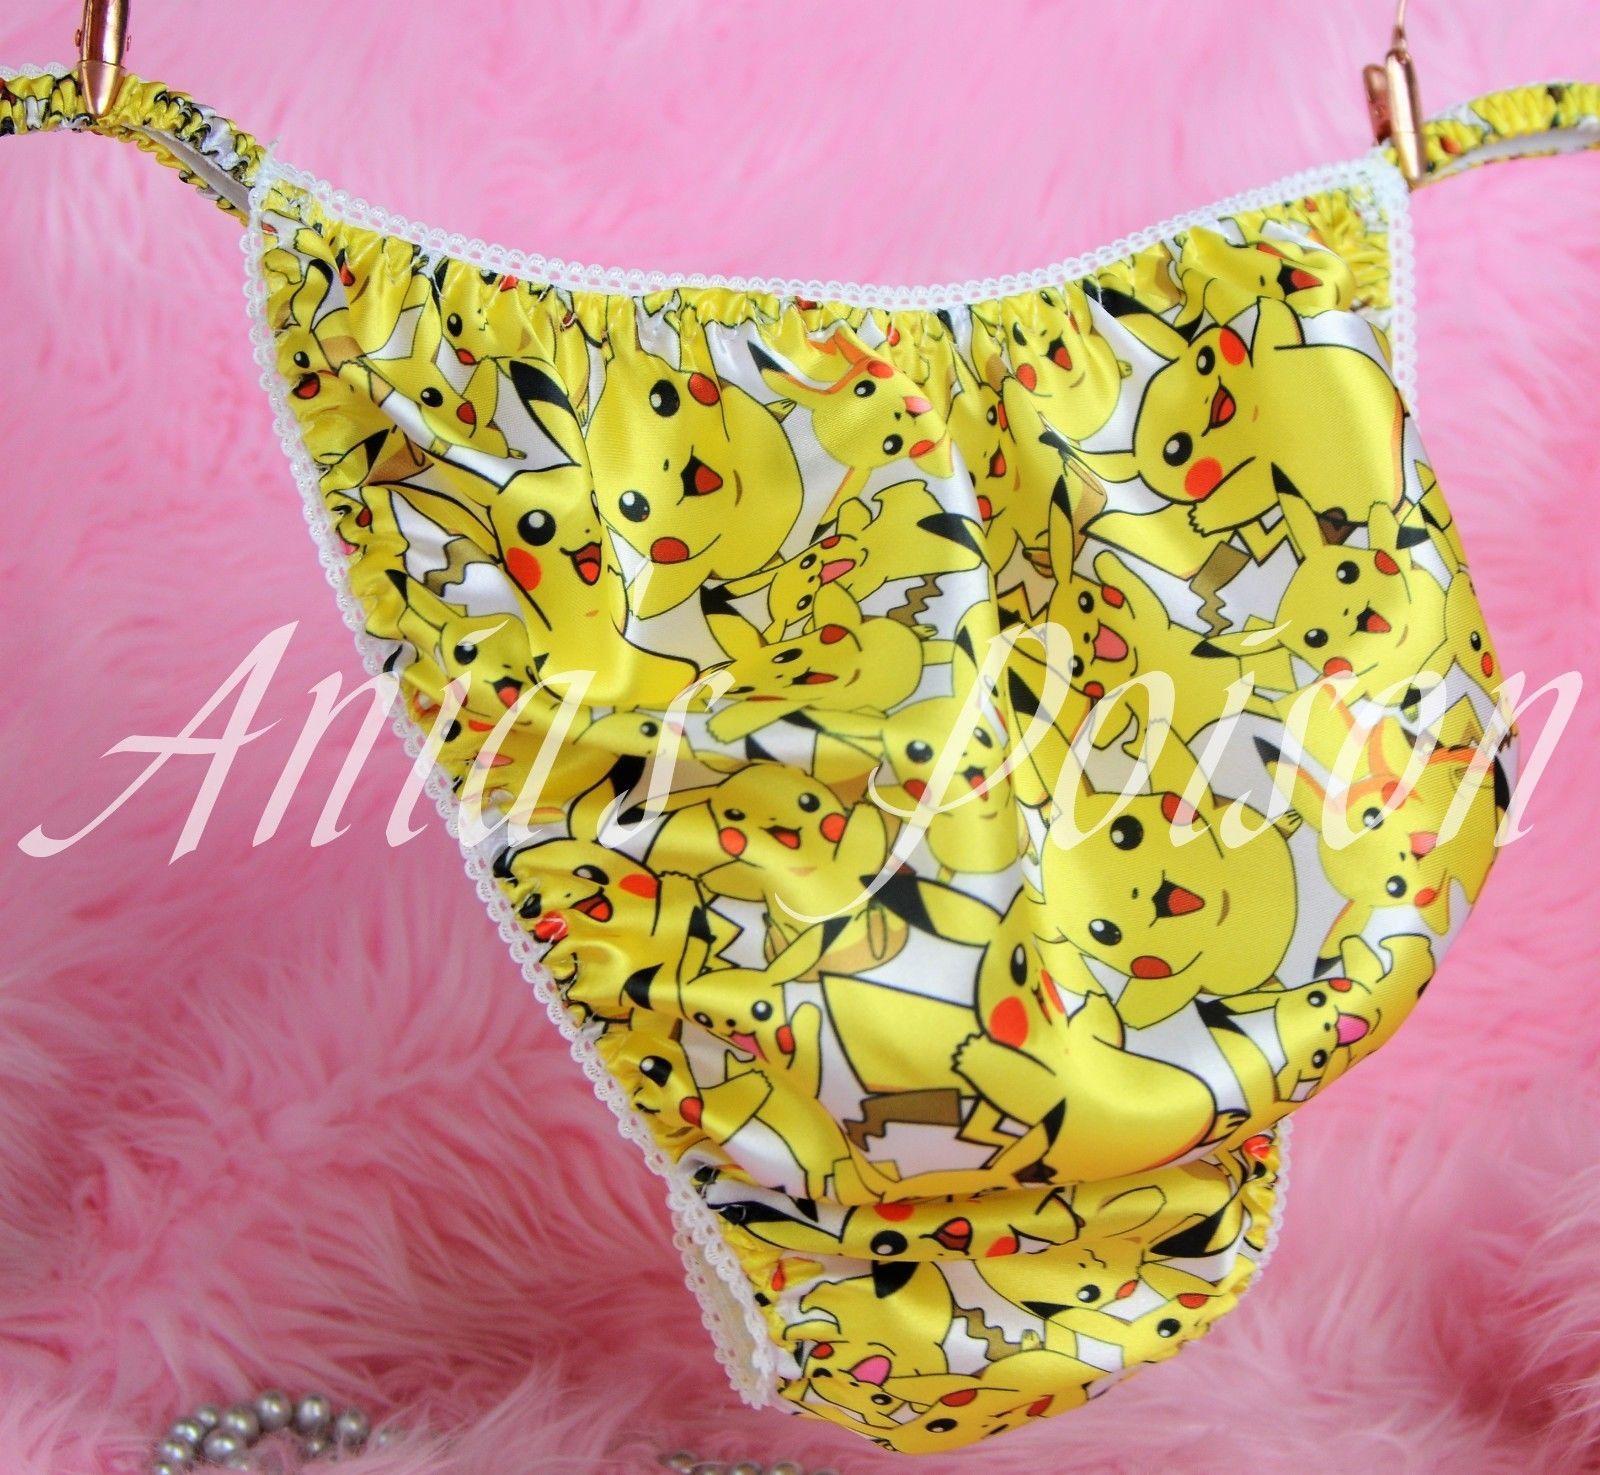 Ania's Poison MANties Pokemon Pikachu Character Print Super Rare 100% polyester string bikini sissy mens underwear panties 00242